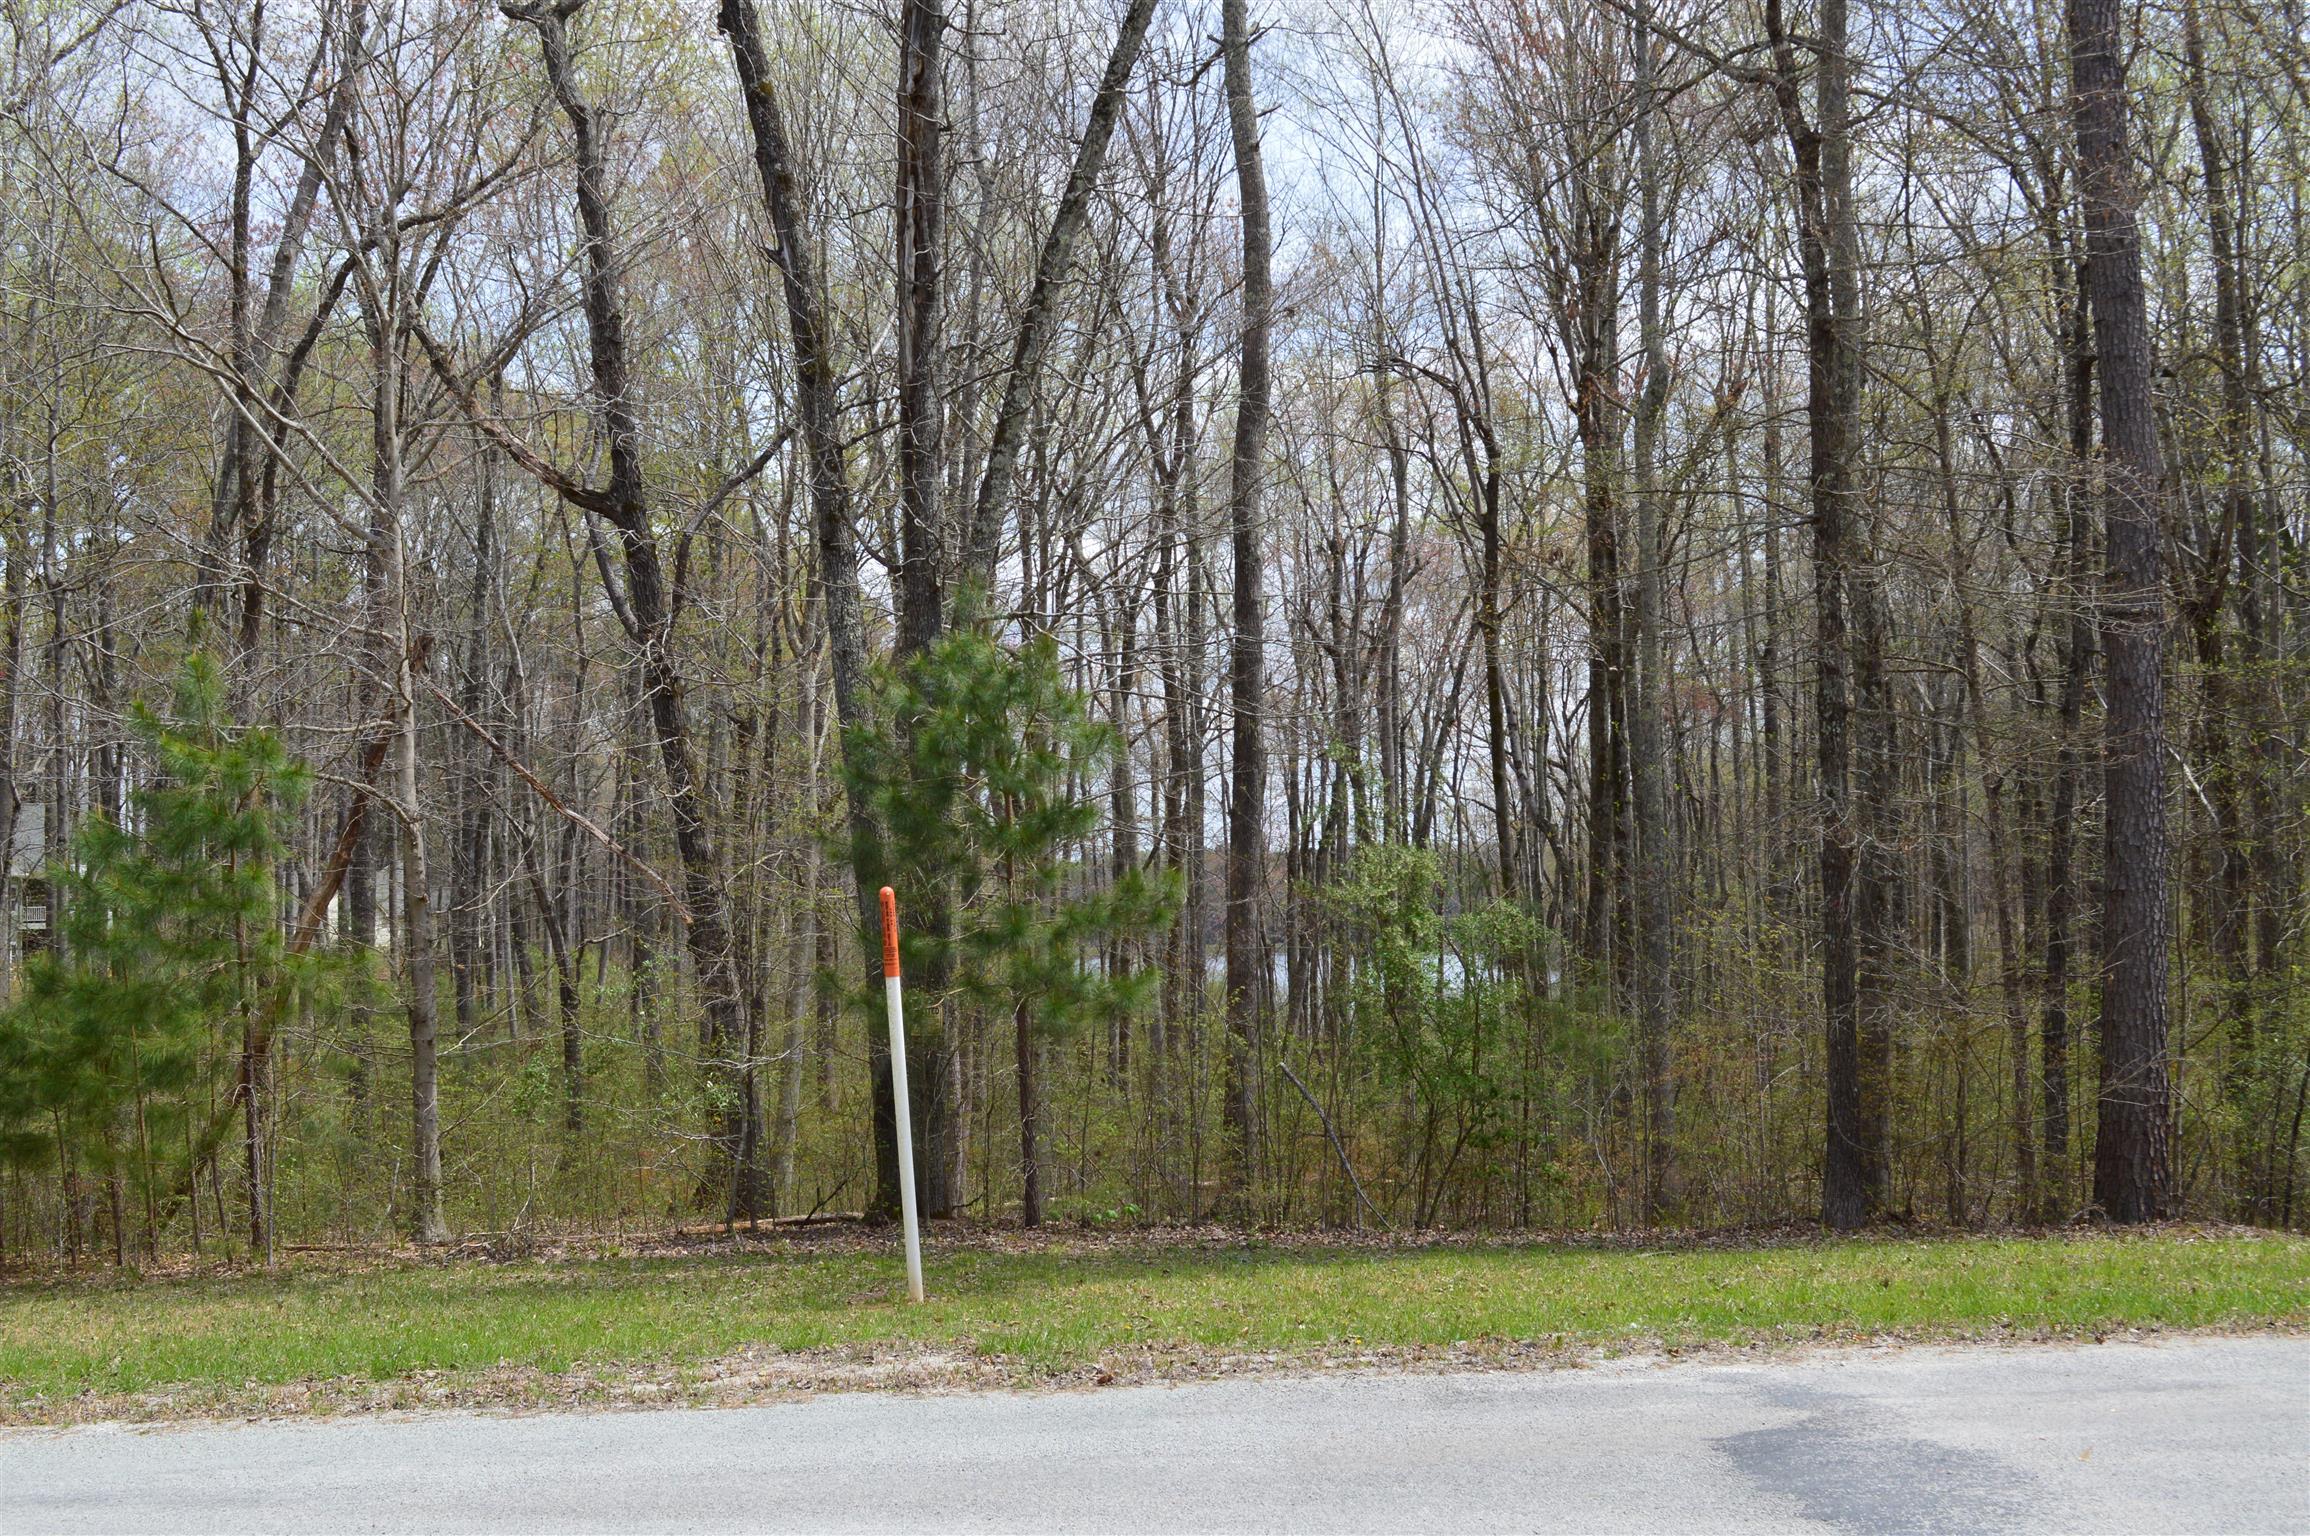 341 Excalibur Trl, Cedar Grove, TN 38321 - Cedar Grove, TN real estate listing